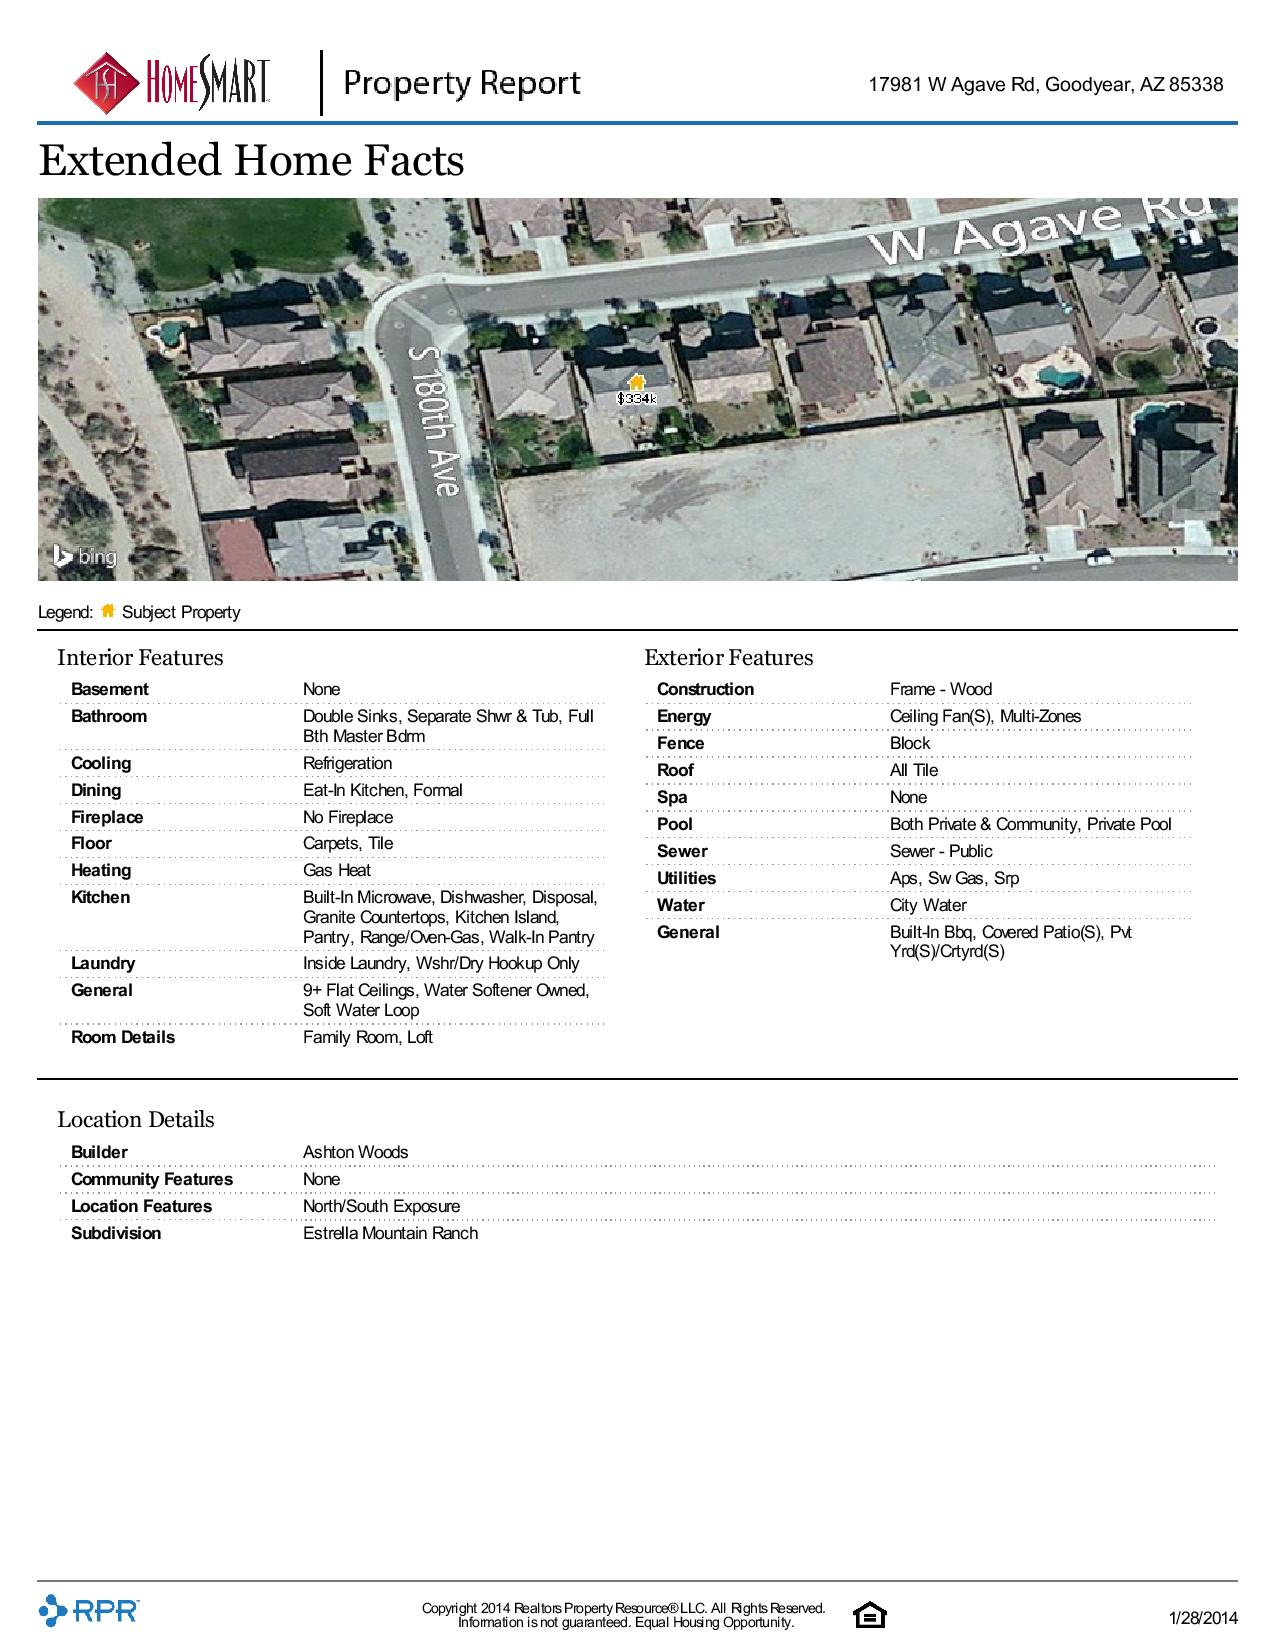 17981-W-Agave-Rd-Goodyear-AZ-85338.pdf-page-004